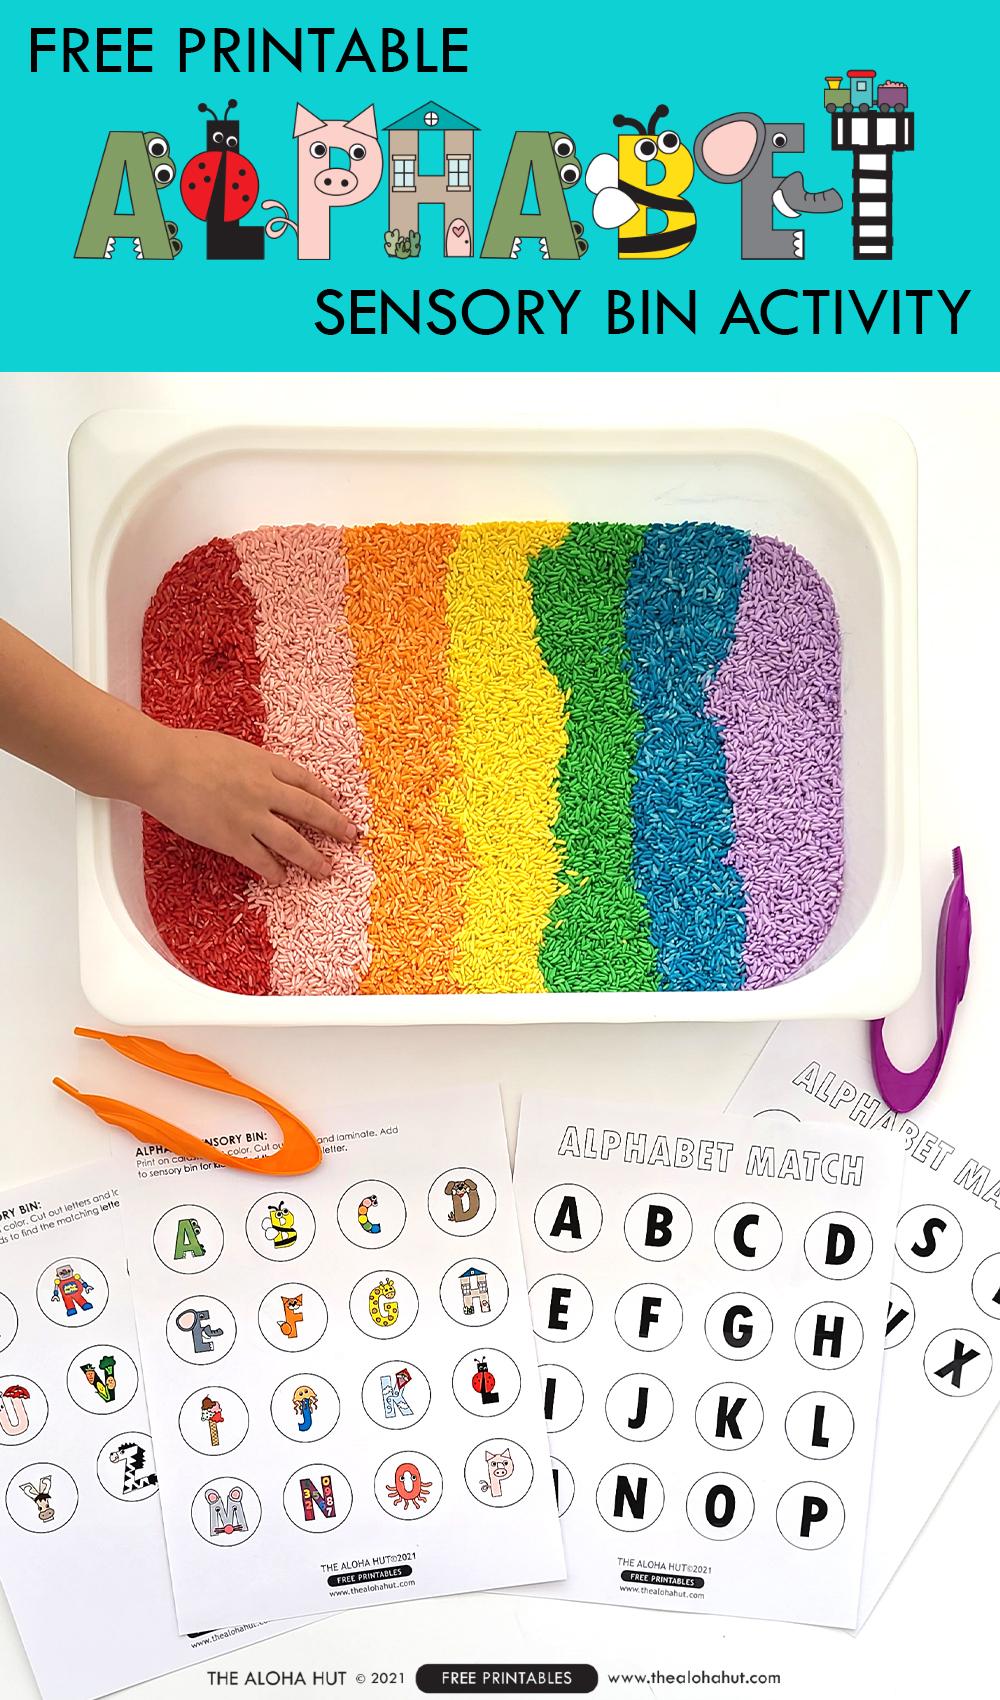 Alphabet Sensory Bin Activity - free printable by the Aloha Hut